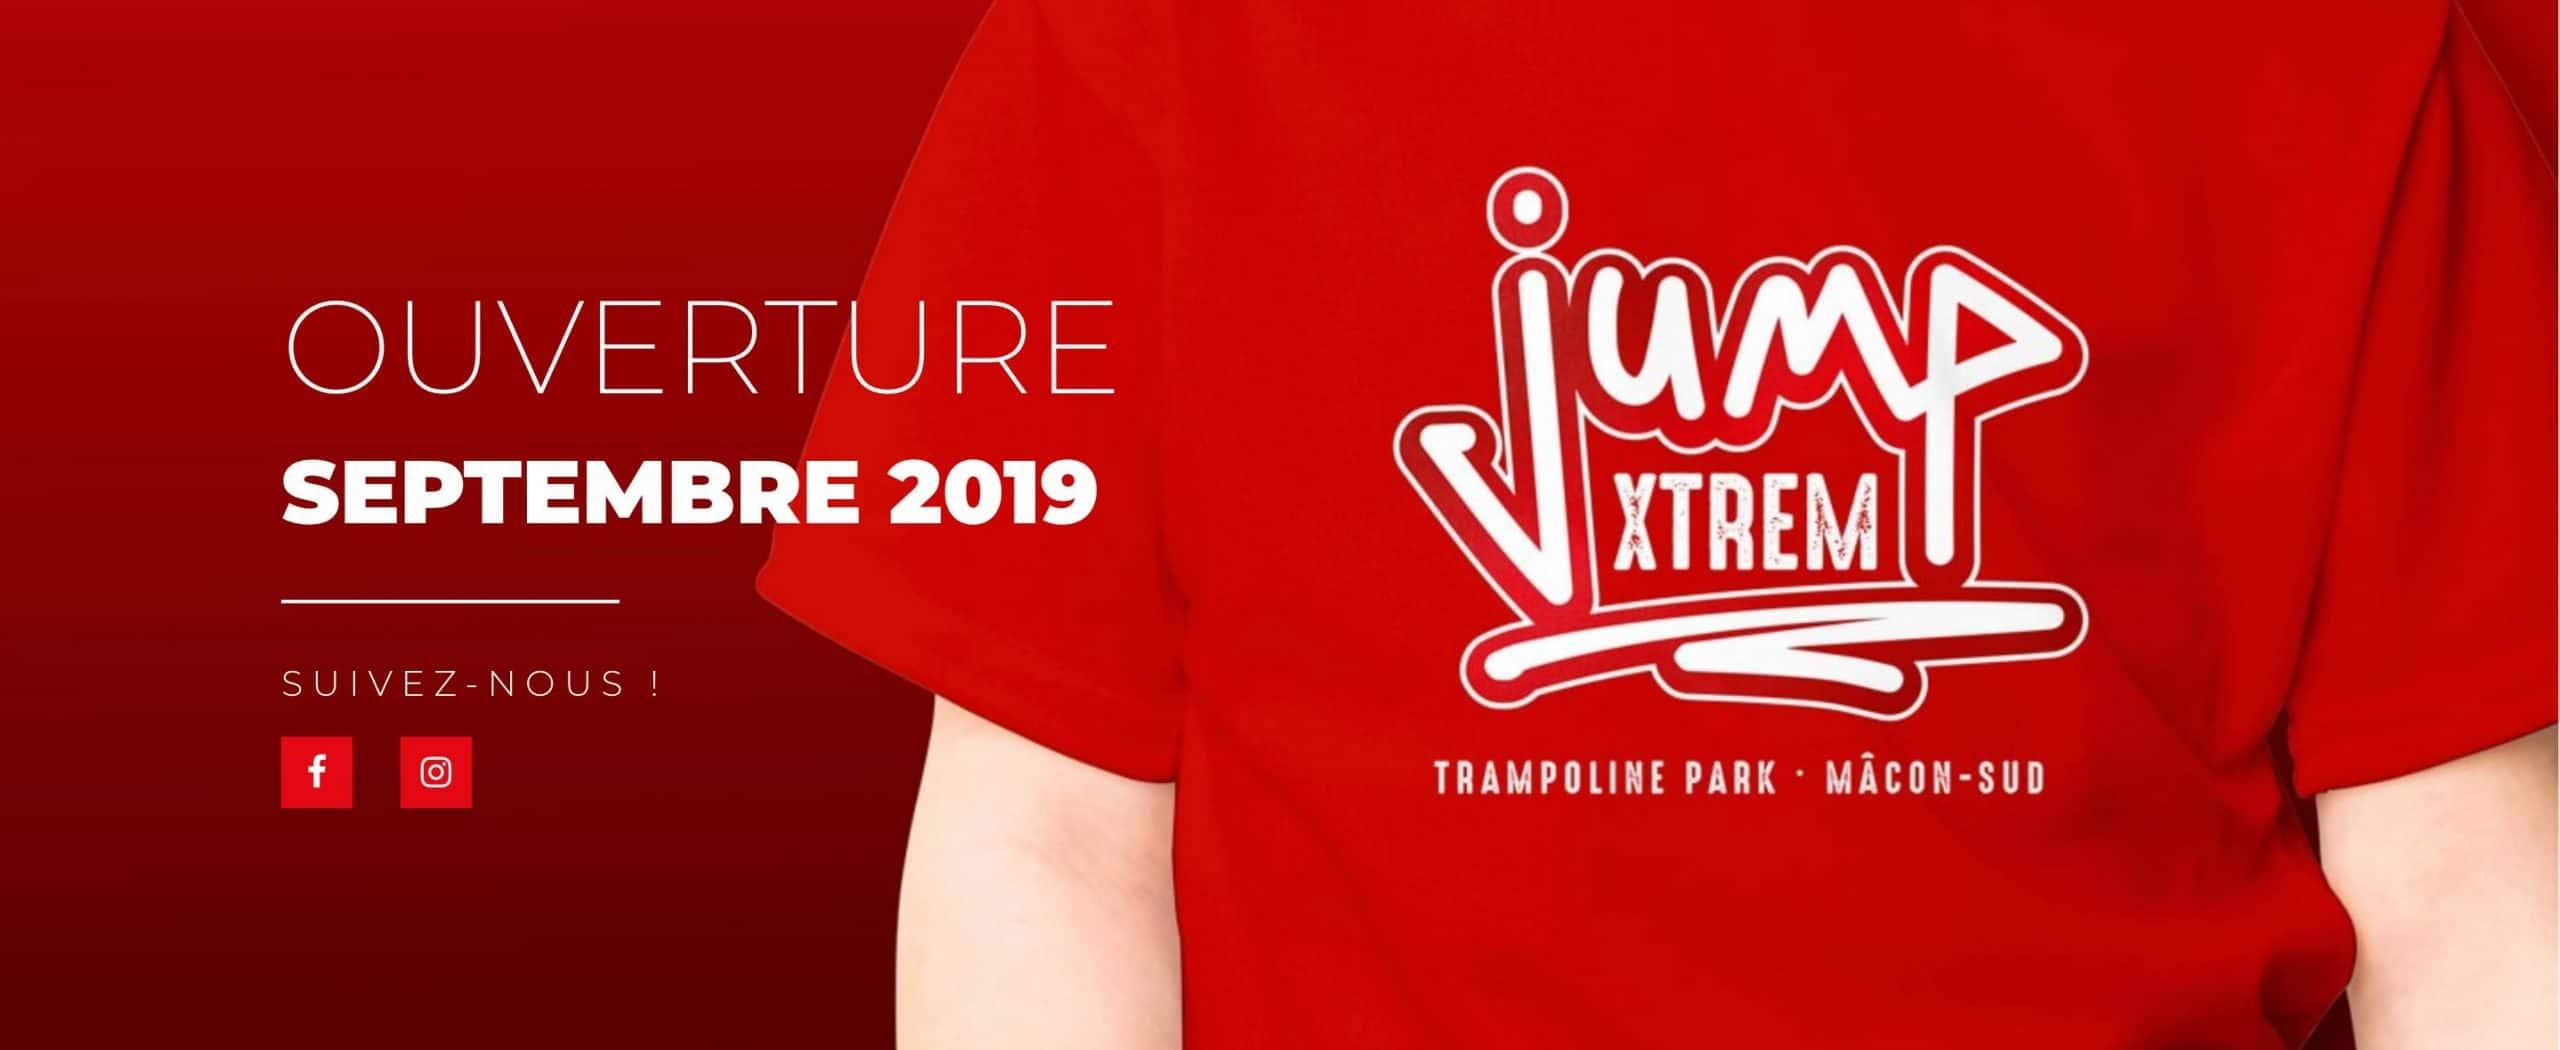 Création campagne communication JumpXtrem